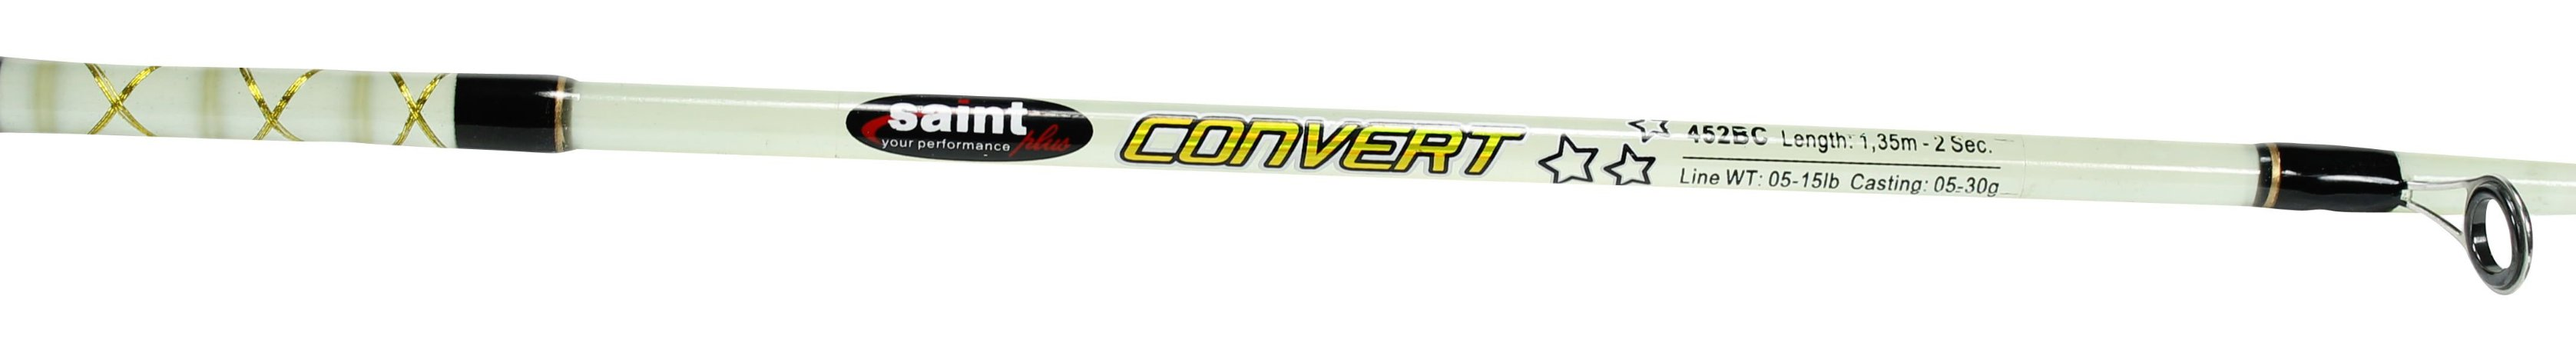 Vara Saint Plus Convert 902BC 2,70m Carretilha 5-15lbs